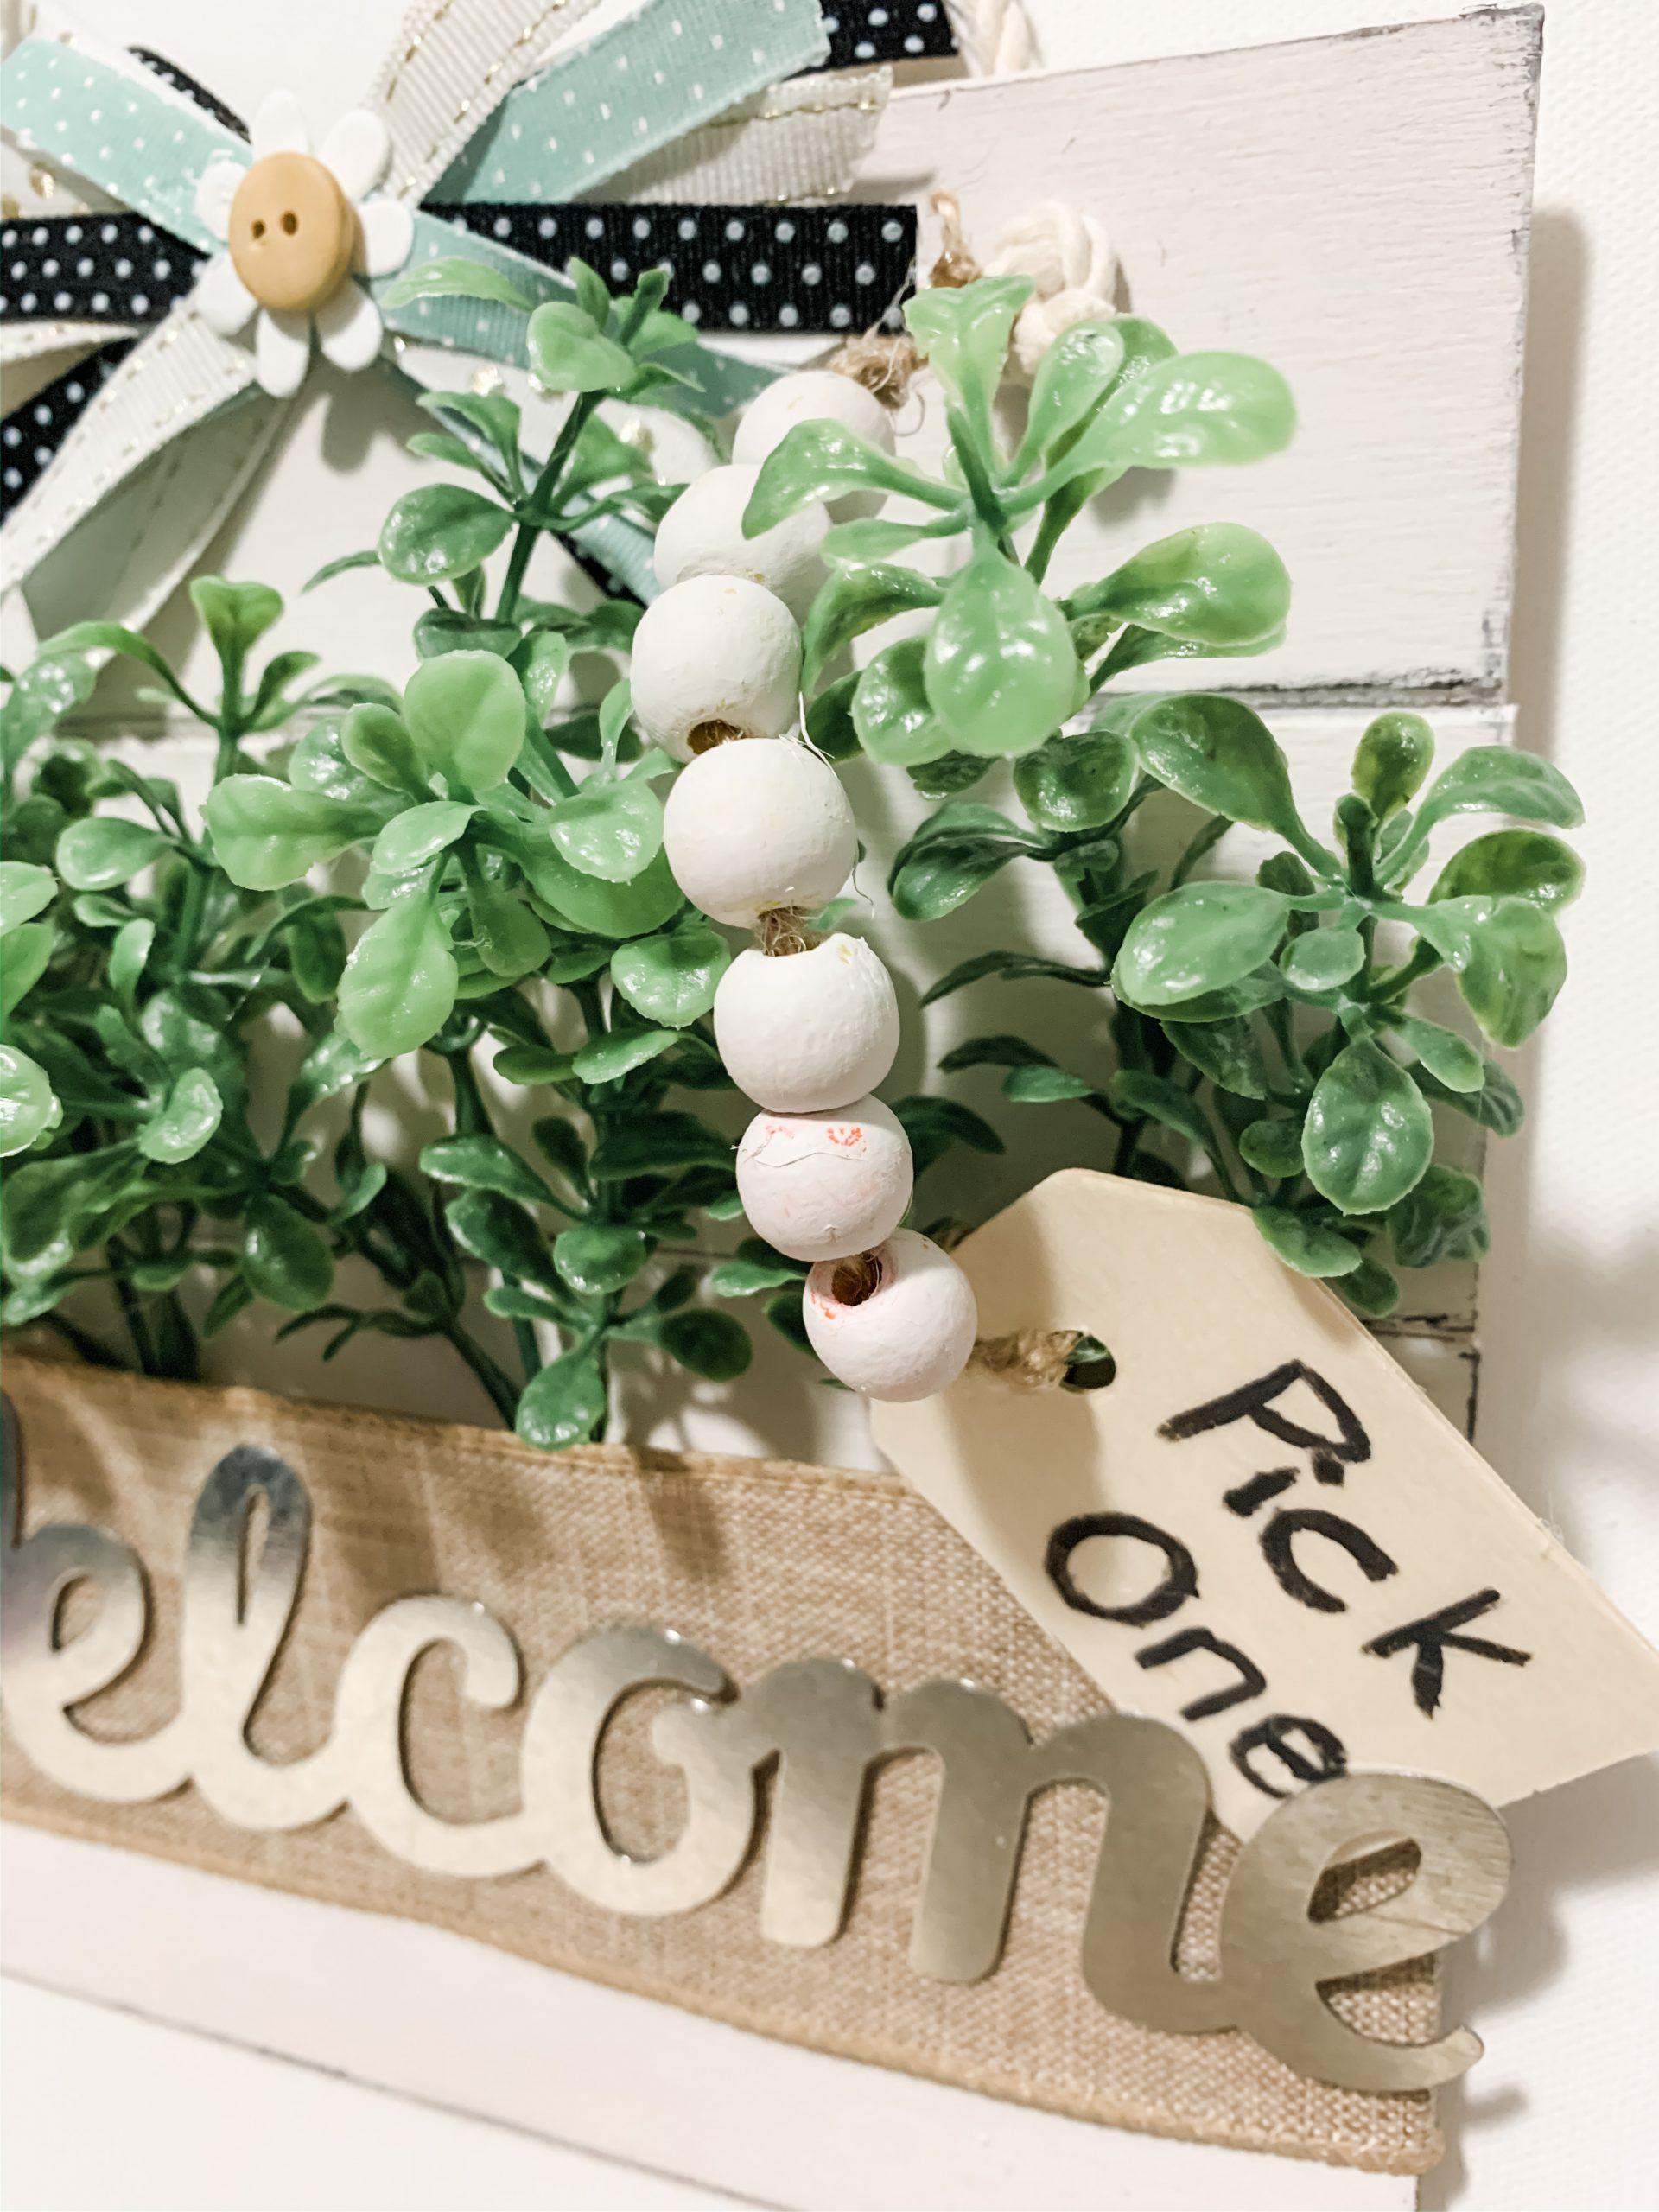 DIY Hanging Spring Welcome Decor